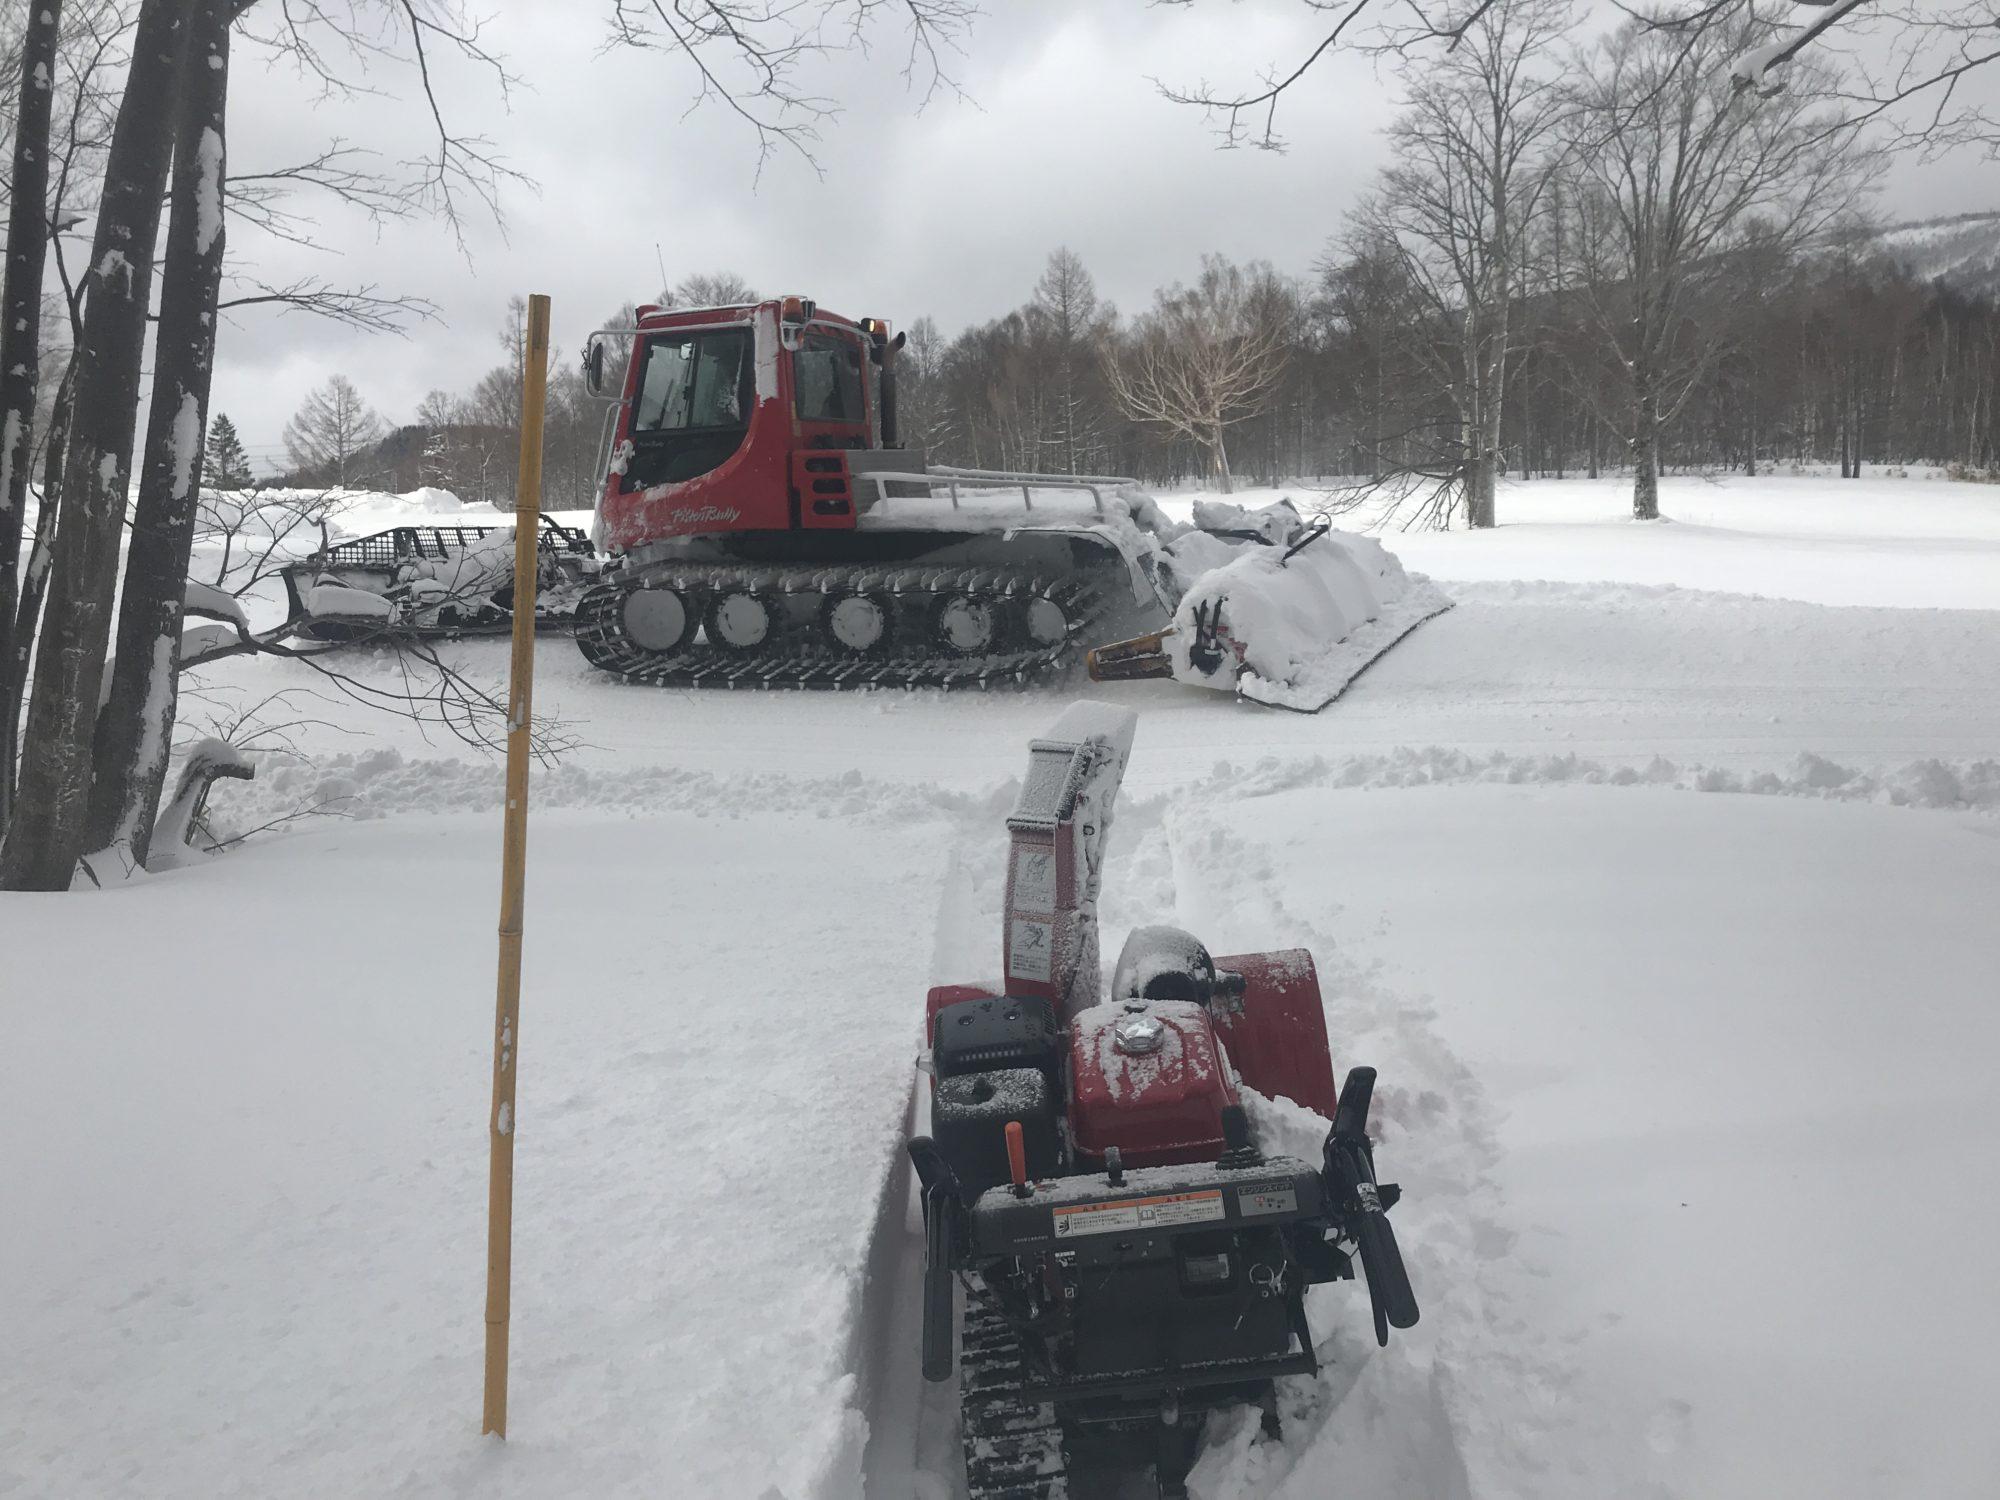 2020 feb 圧雪車よ、help!!